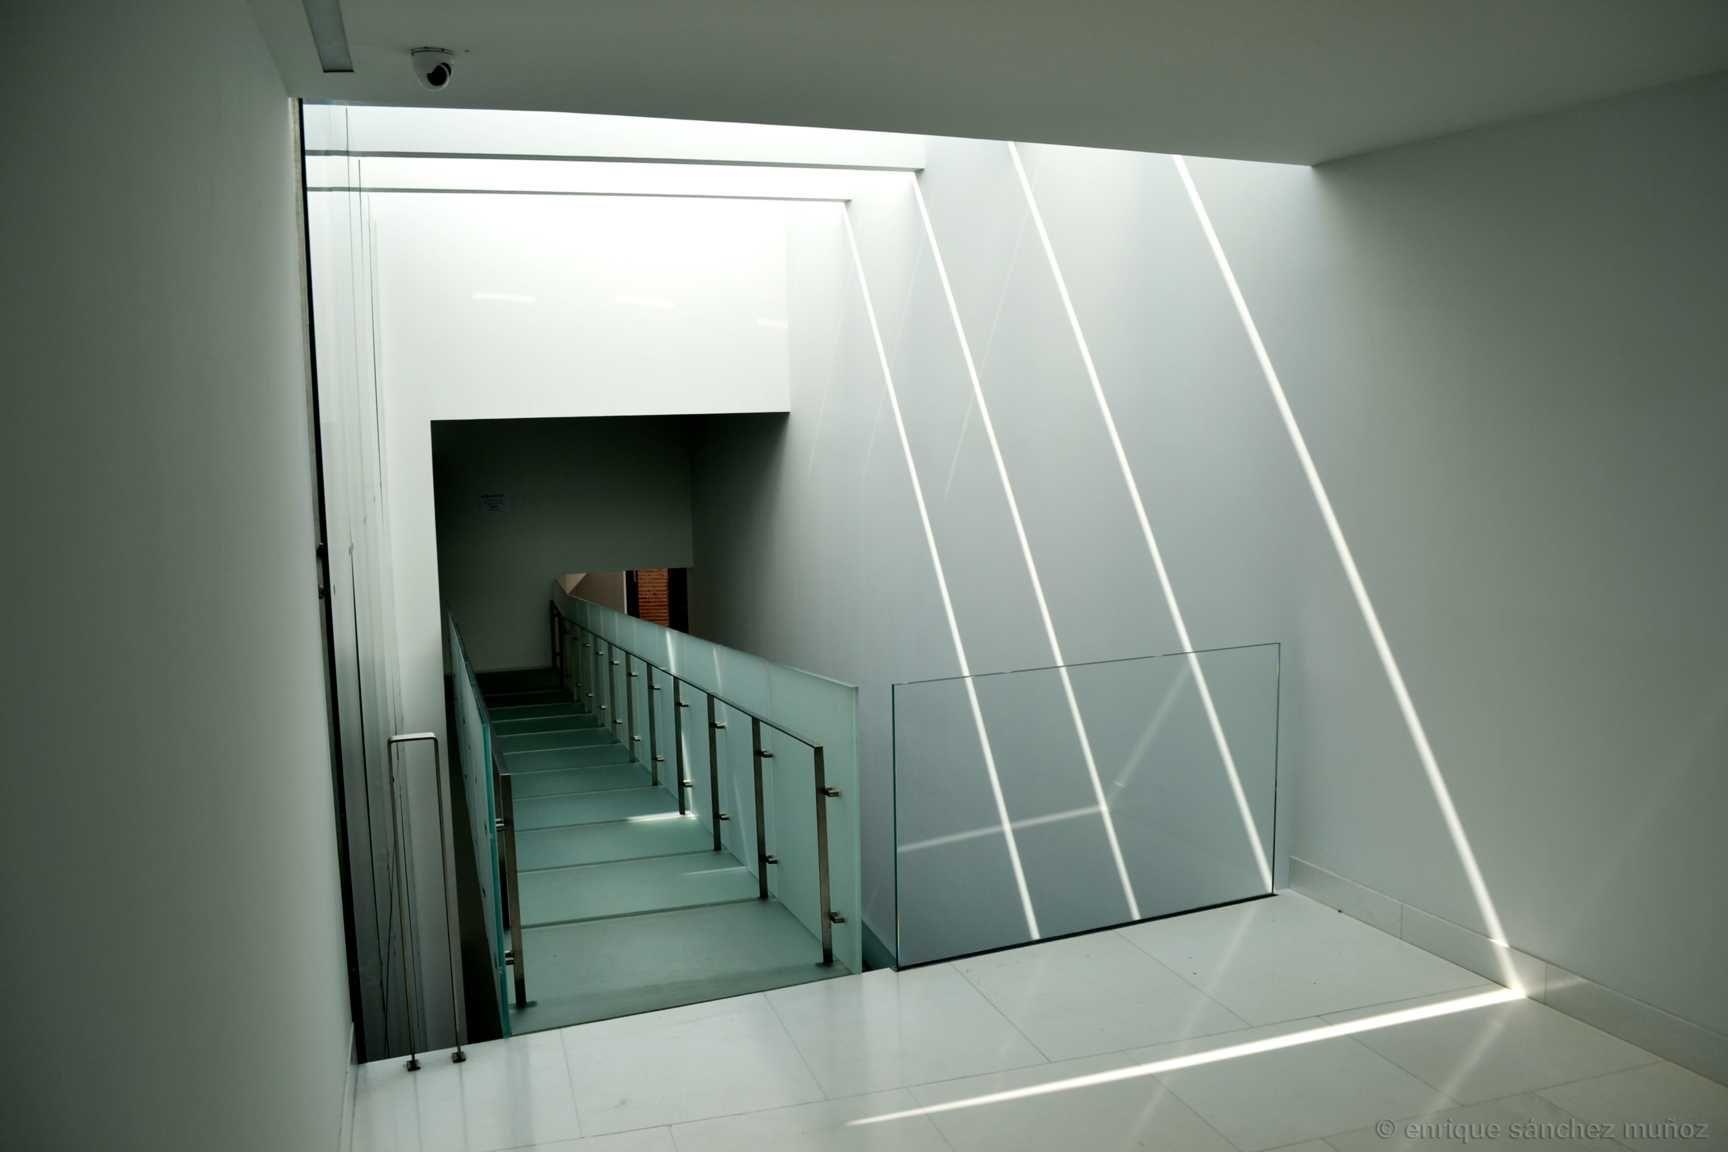 Colegio de arquitectos de toledo spain arq antonio - Colegio de arquitectos toledo ...